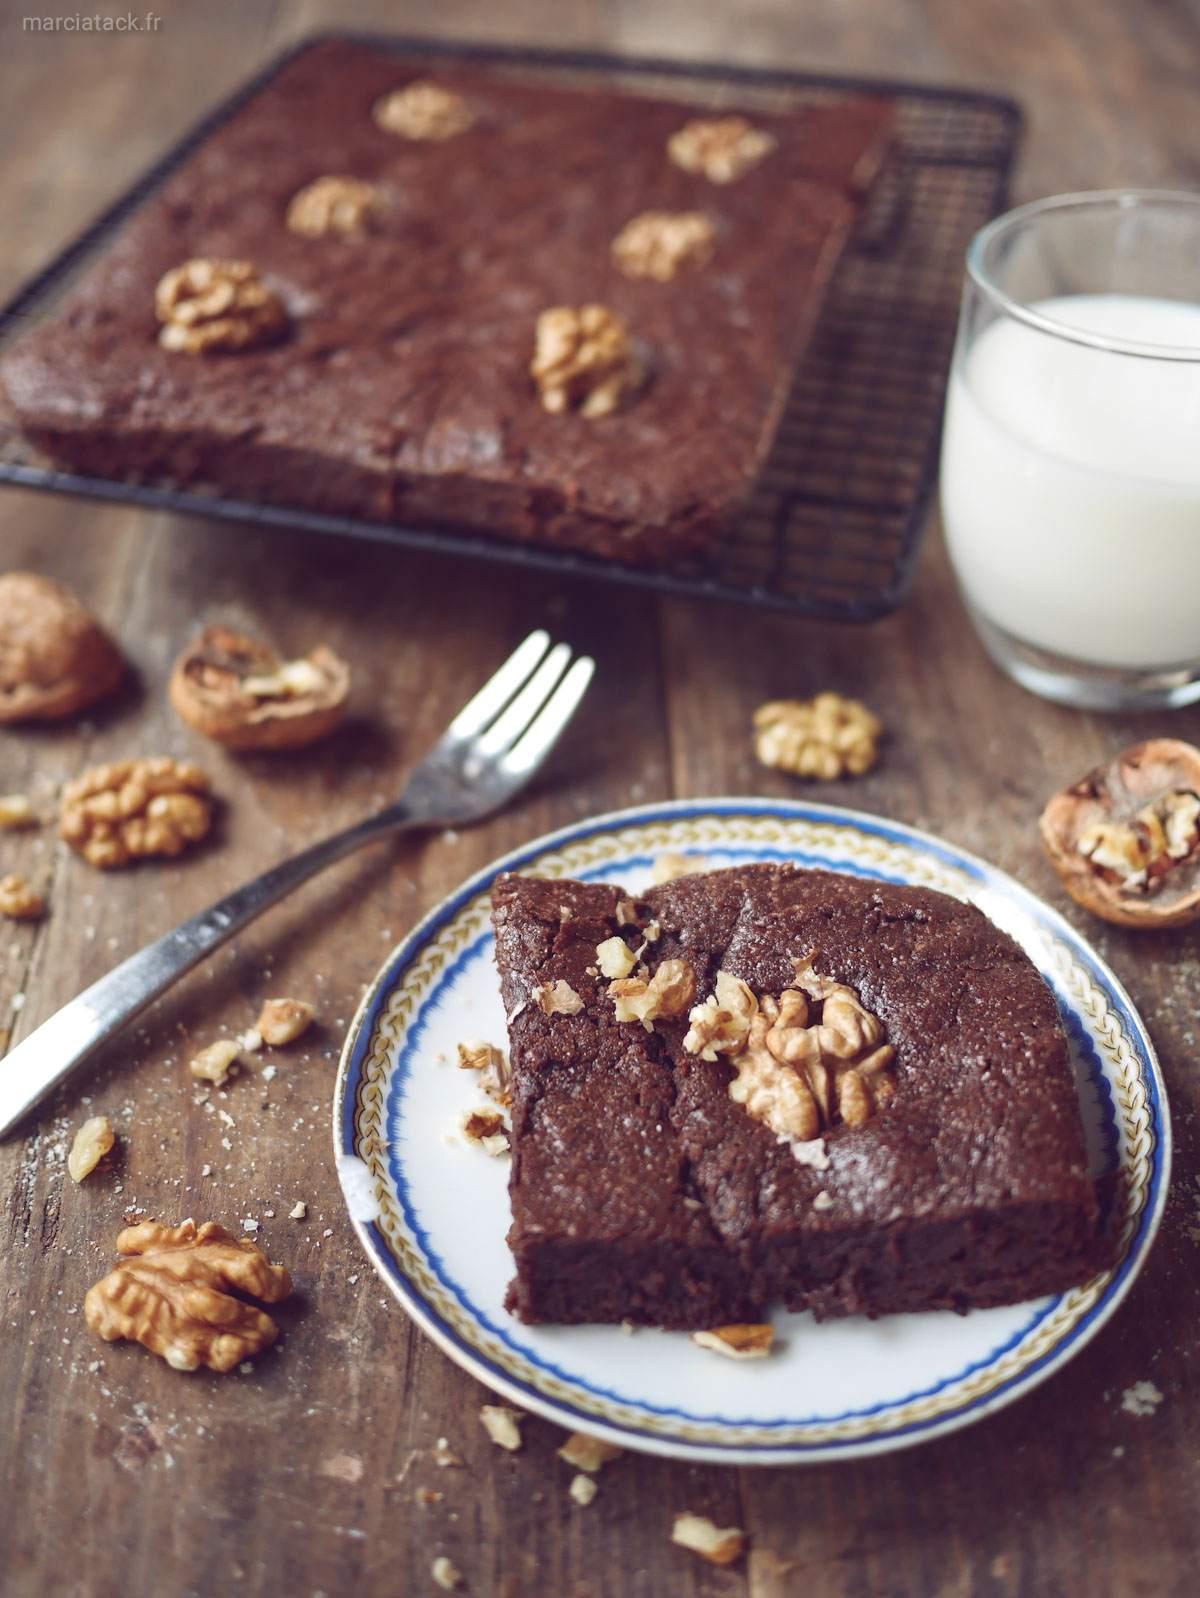 Brownie De Cyril Lignac : brownie, cyril, lignac, Brownie, Cyril, Lignac, Recette, Chocolat